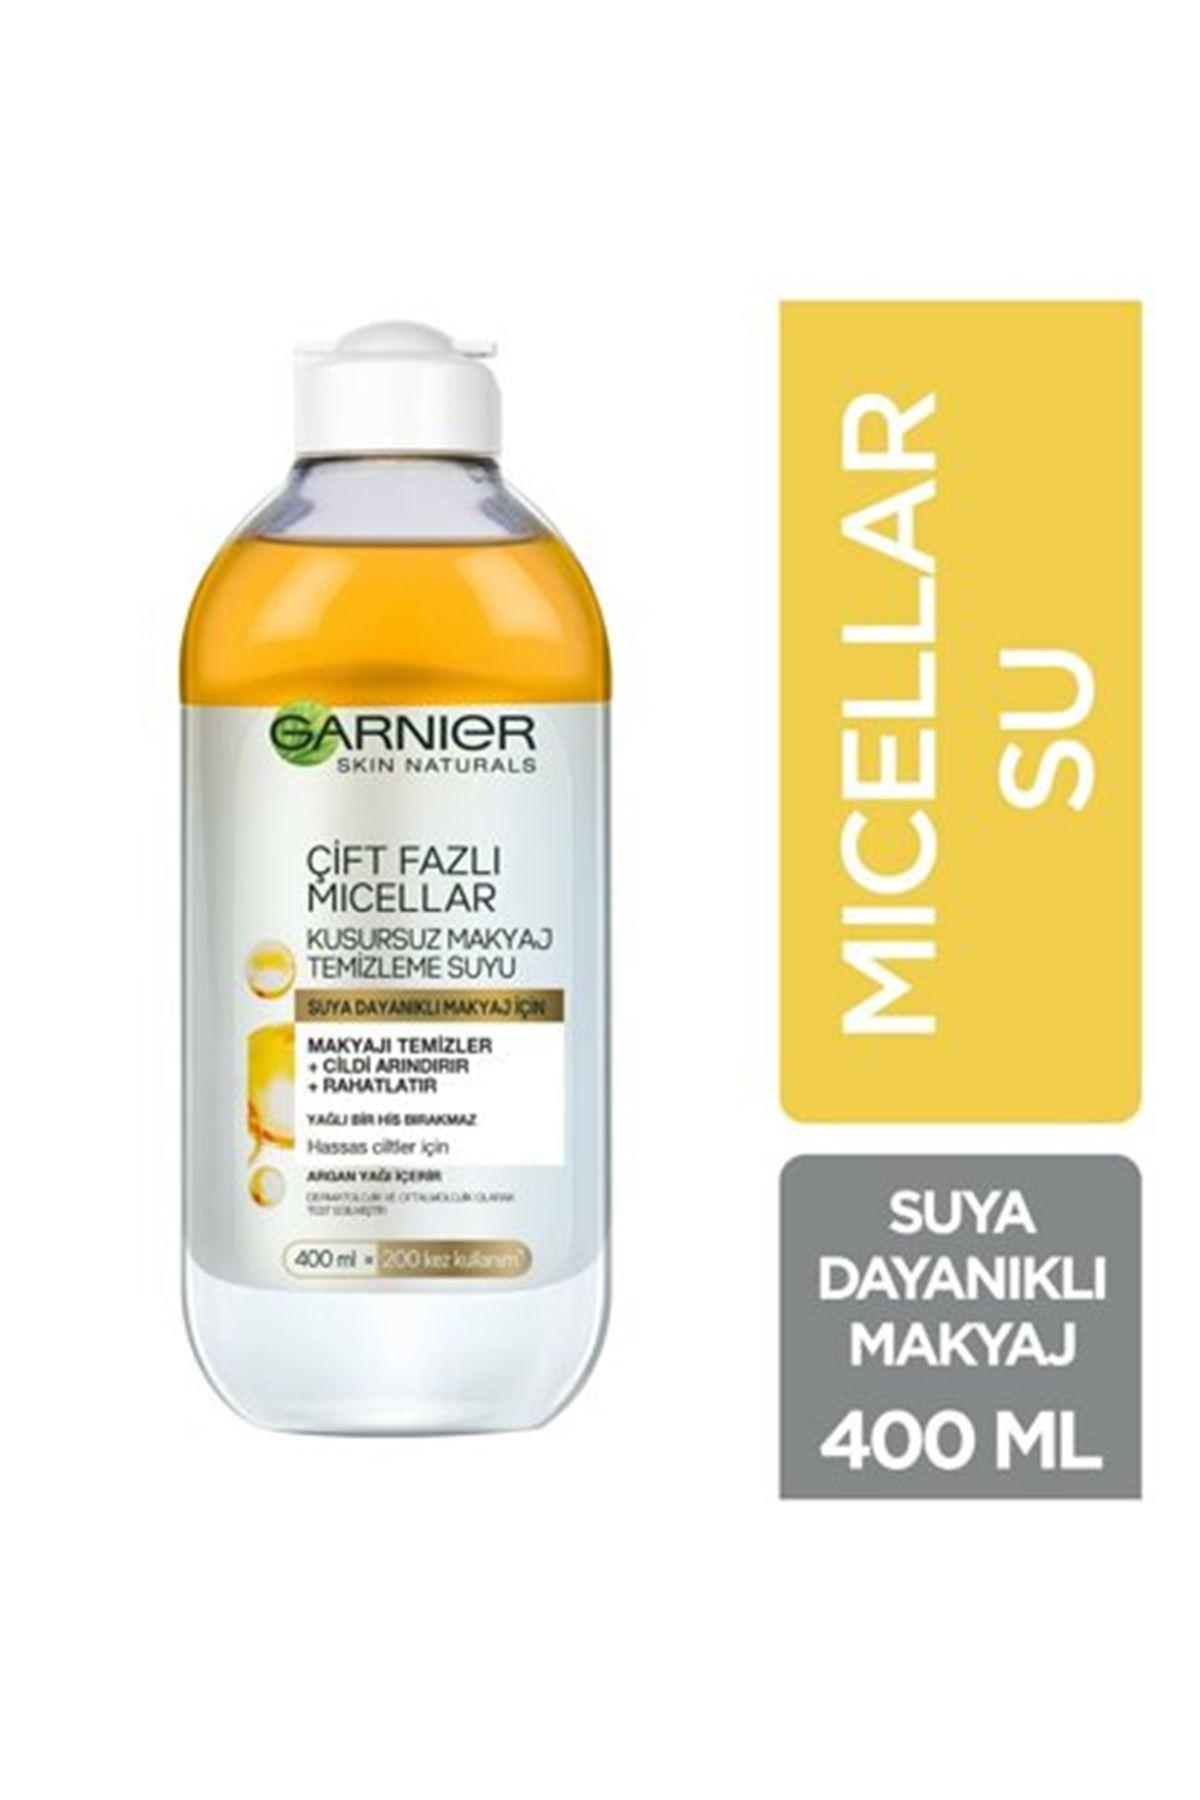 Garnier Çift Fazlı Micellar Kusursuz Makyaj Temizleme Suyu 400 ml